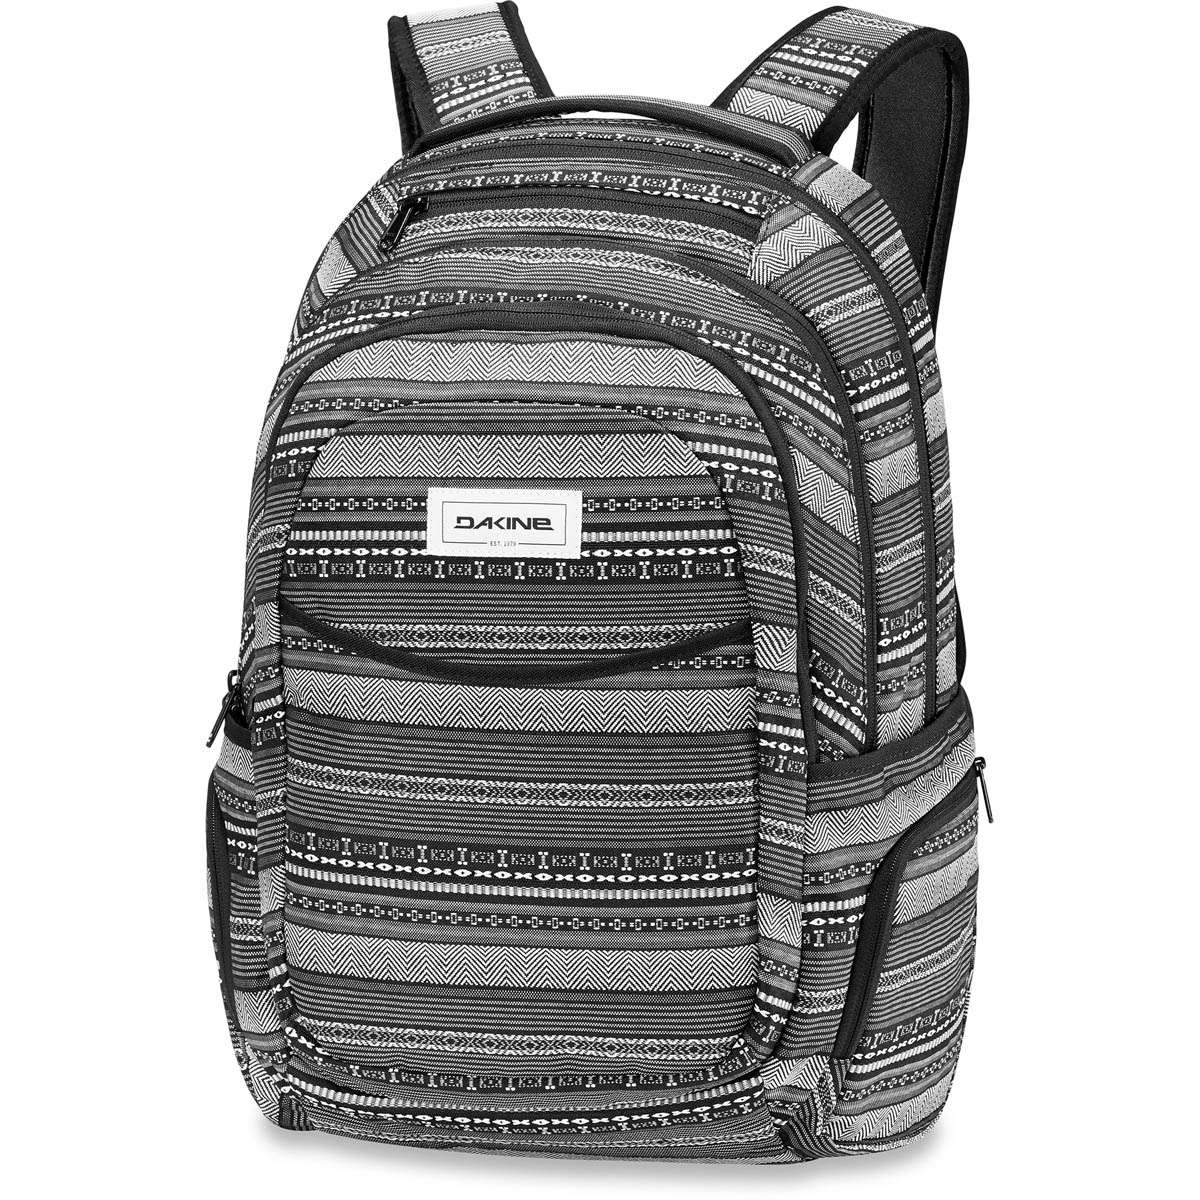 ec8bd7243a675 Dakine Prom SR 27L Backpack Zion